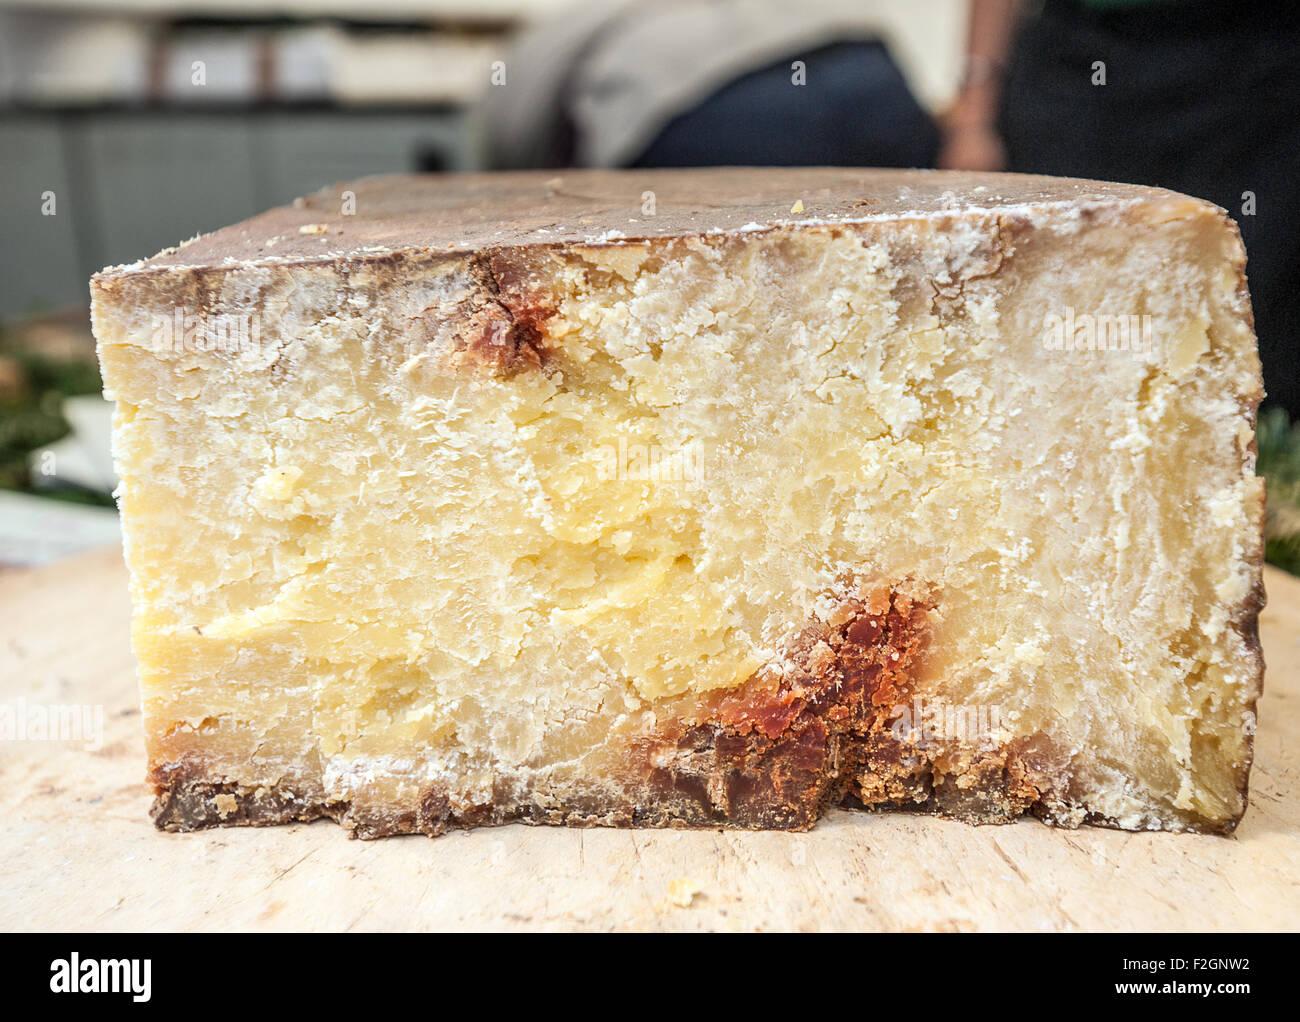 Italy Piedmont Bra 18th September 2015 the fair 'Cheese'- Bagoss Bagolino ( Lombardy ) - Slow Food Presidium - Stock Image